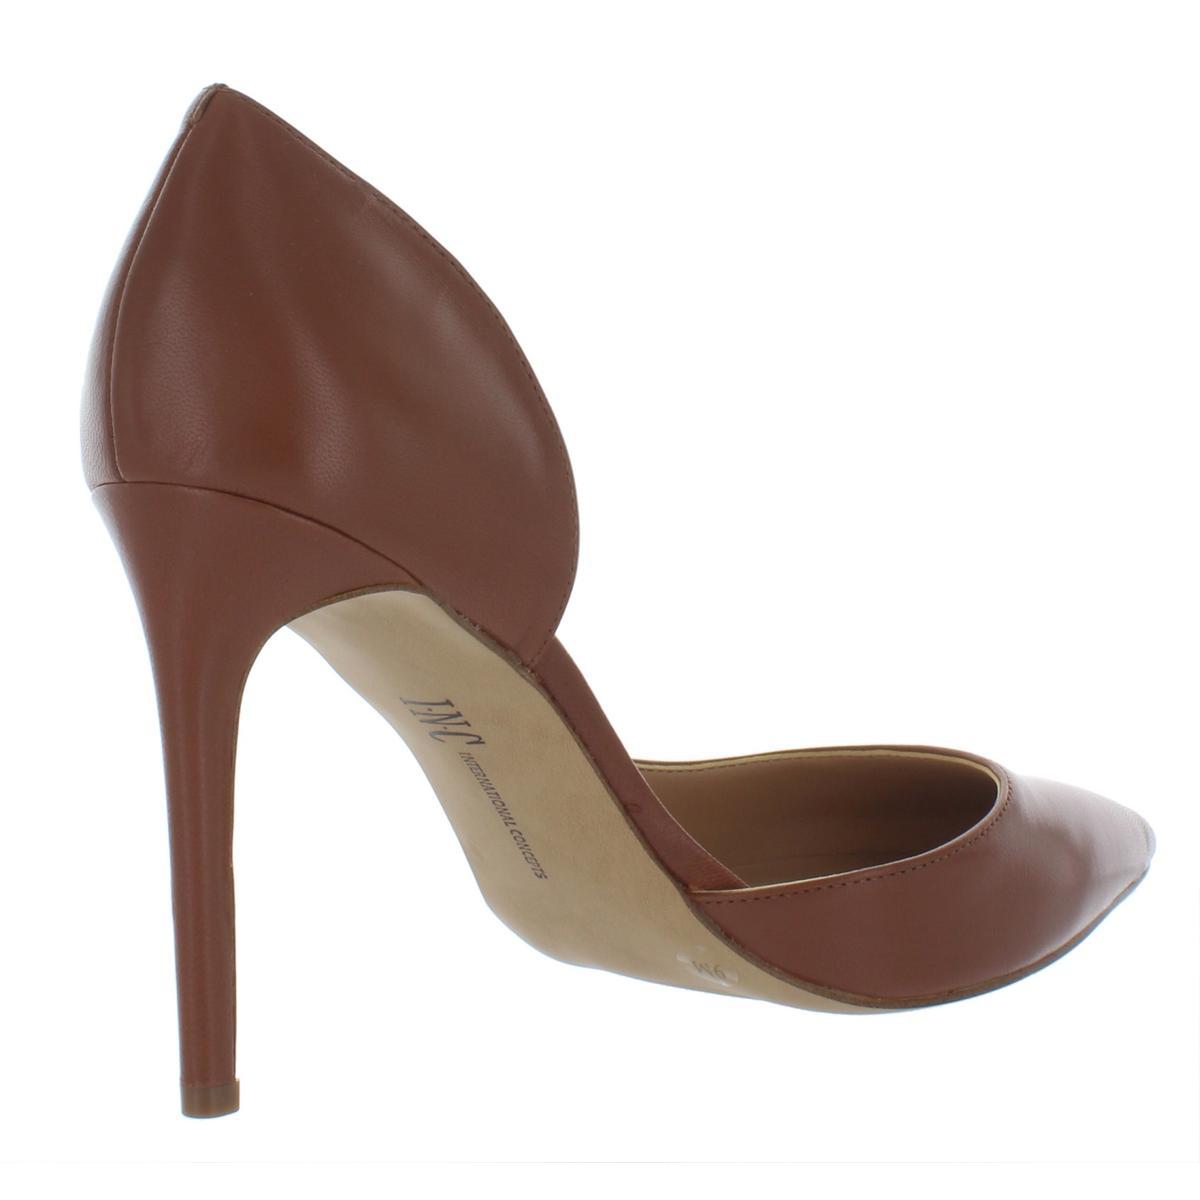 INC-Womens-Kenjay-Padded-Insole-Stiletto-Dress-D-039-Orsay-Heels-Shoes-BHFO-7446 thumbnail 8